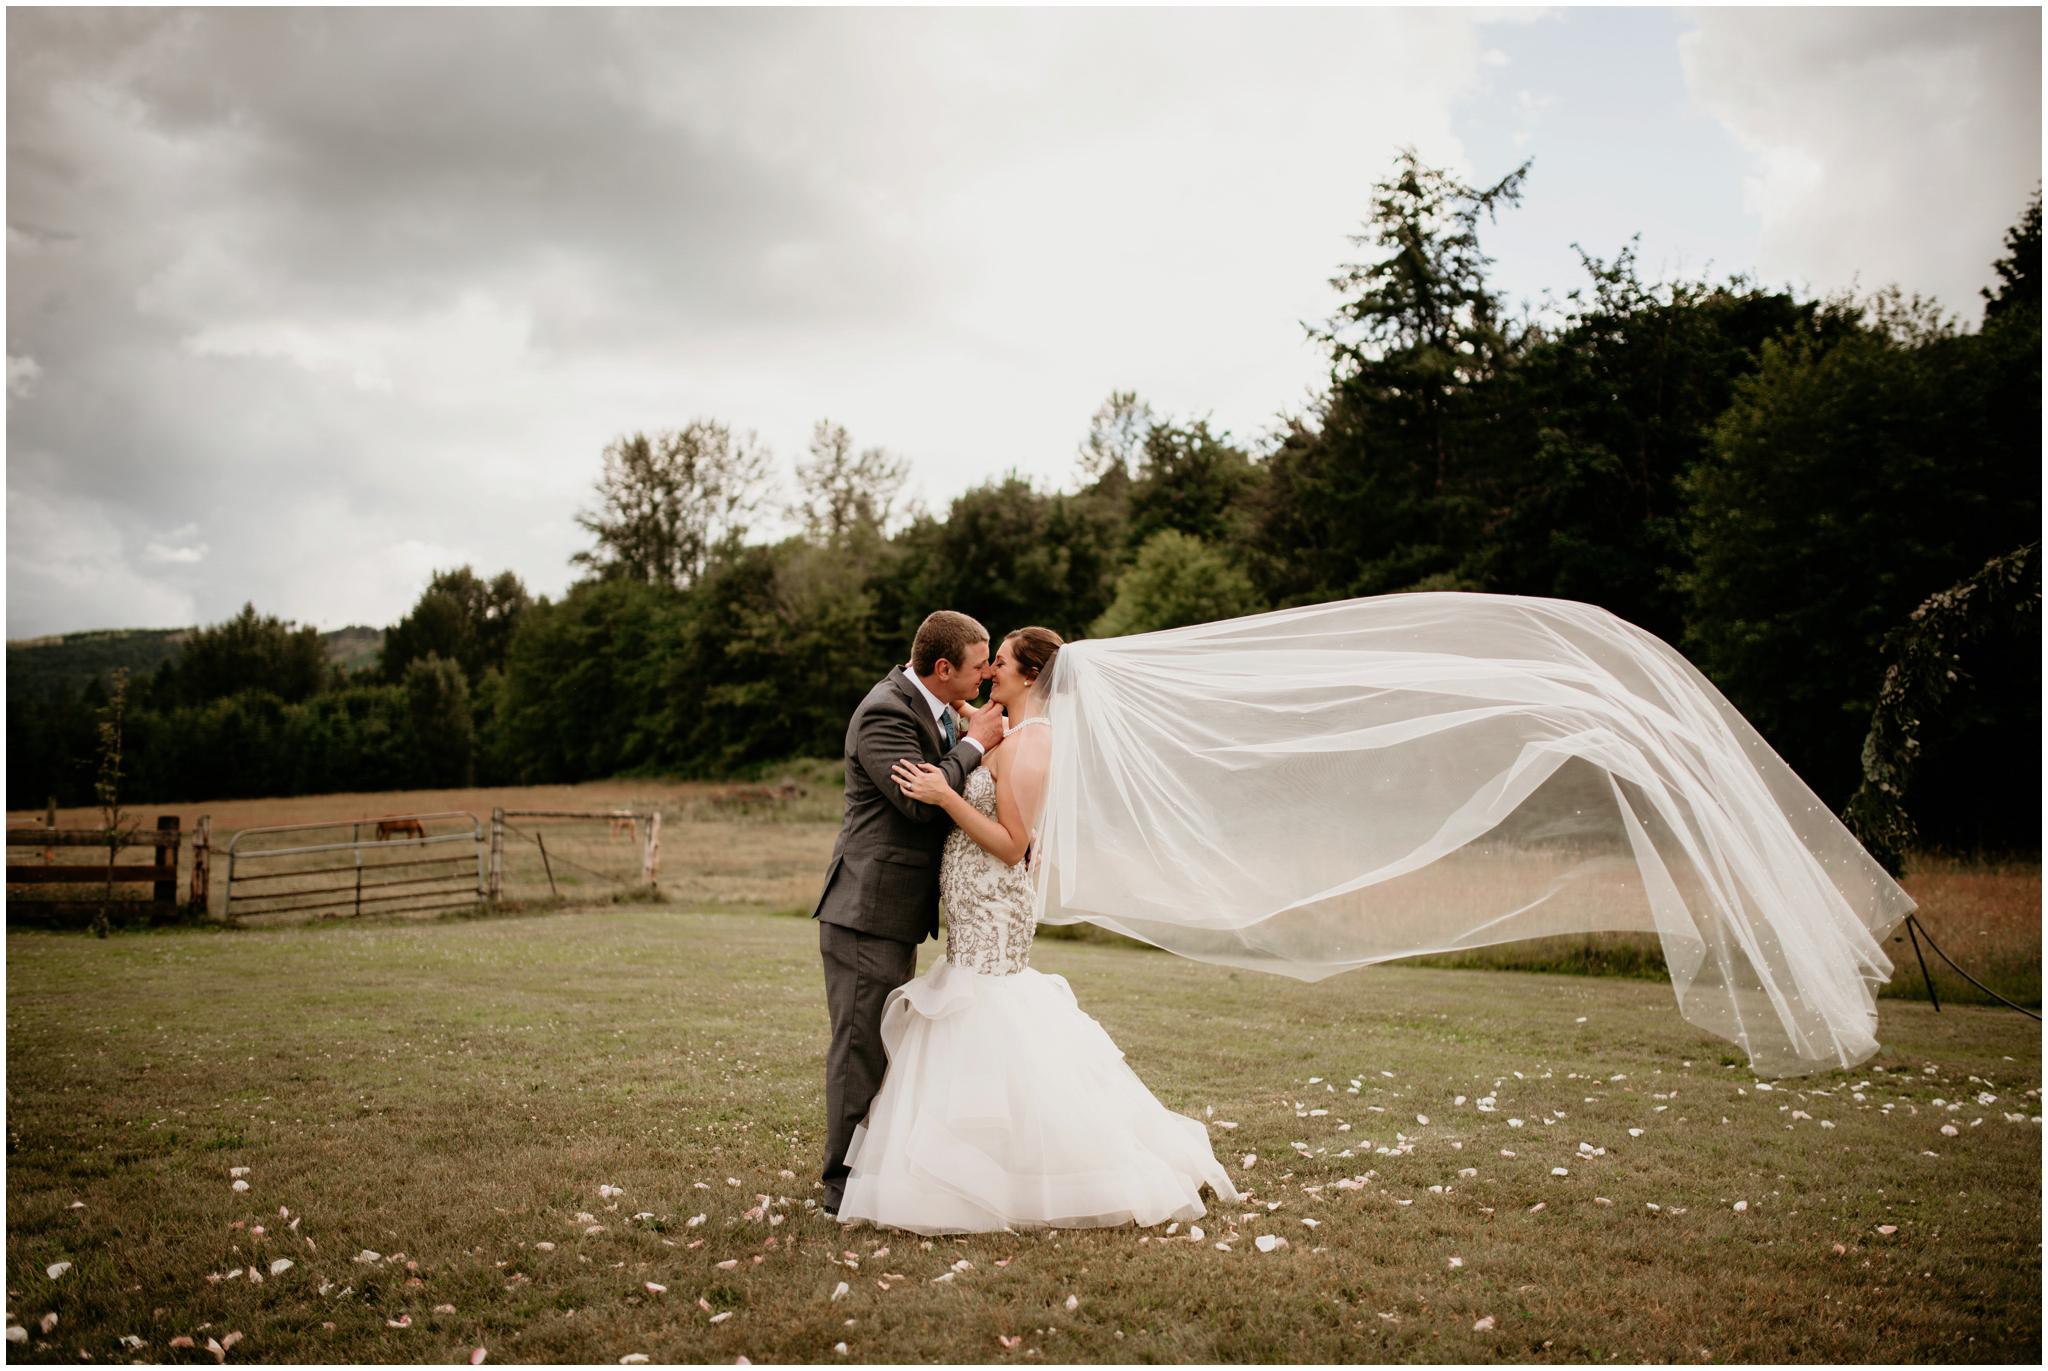 alex-and-matthew-three-cs-farm-venue-seattle-wedding-photographer-142.jpg